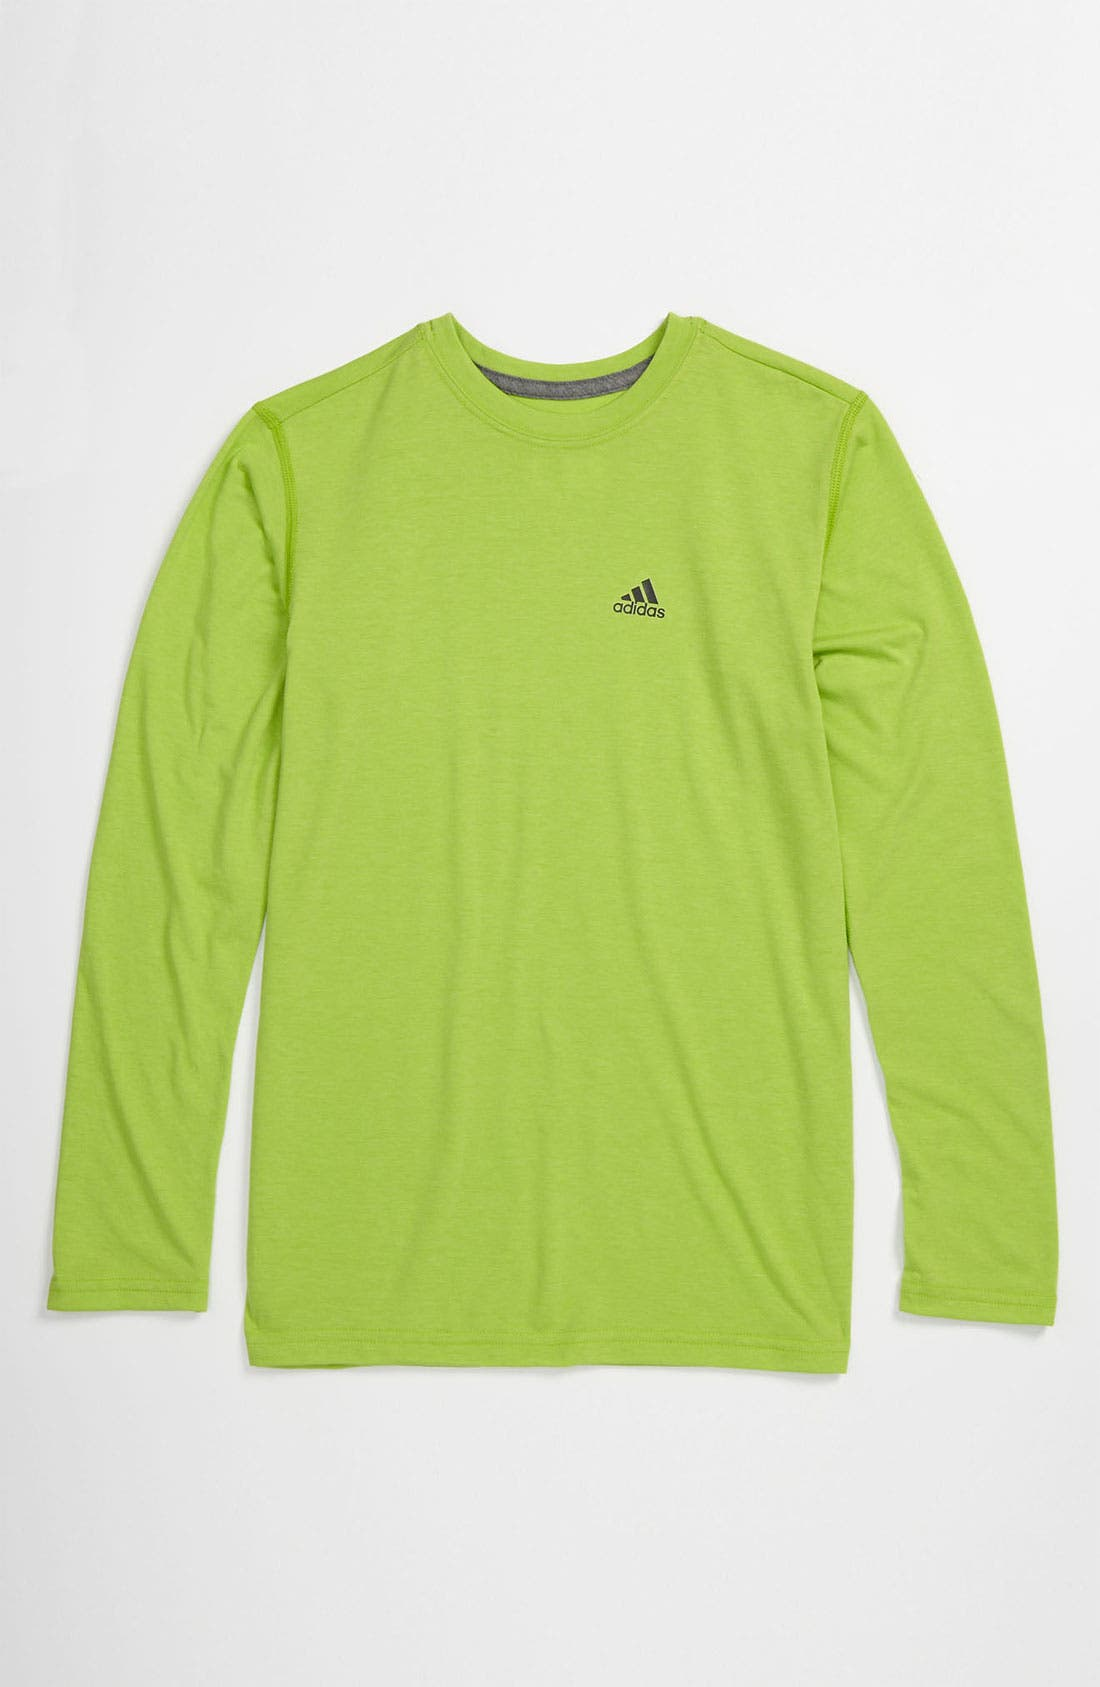 Main Image - adidas 'Ultimate' T-Shirt (Big Boys)